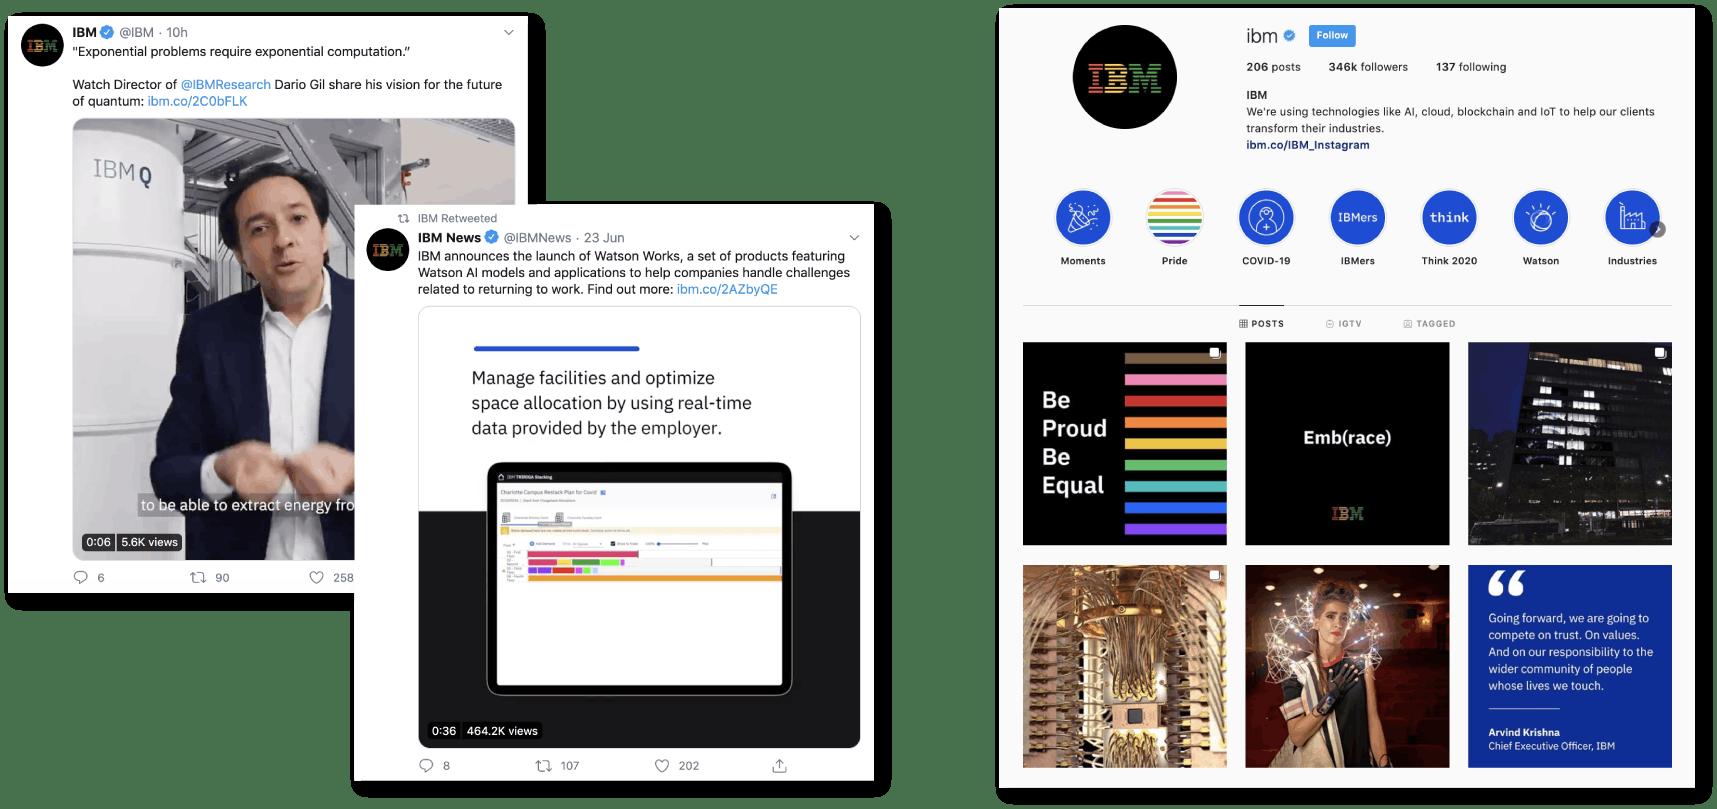 IBM social media pages: left: Twitter, right: Instagram